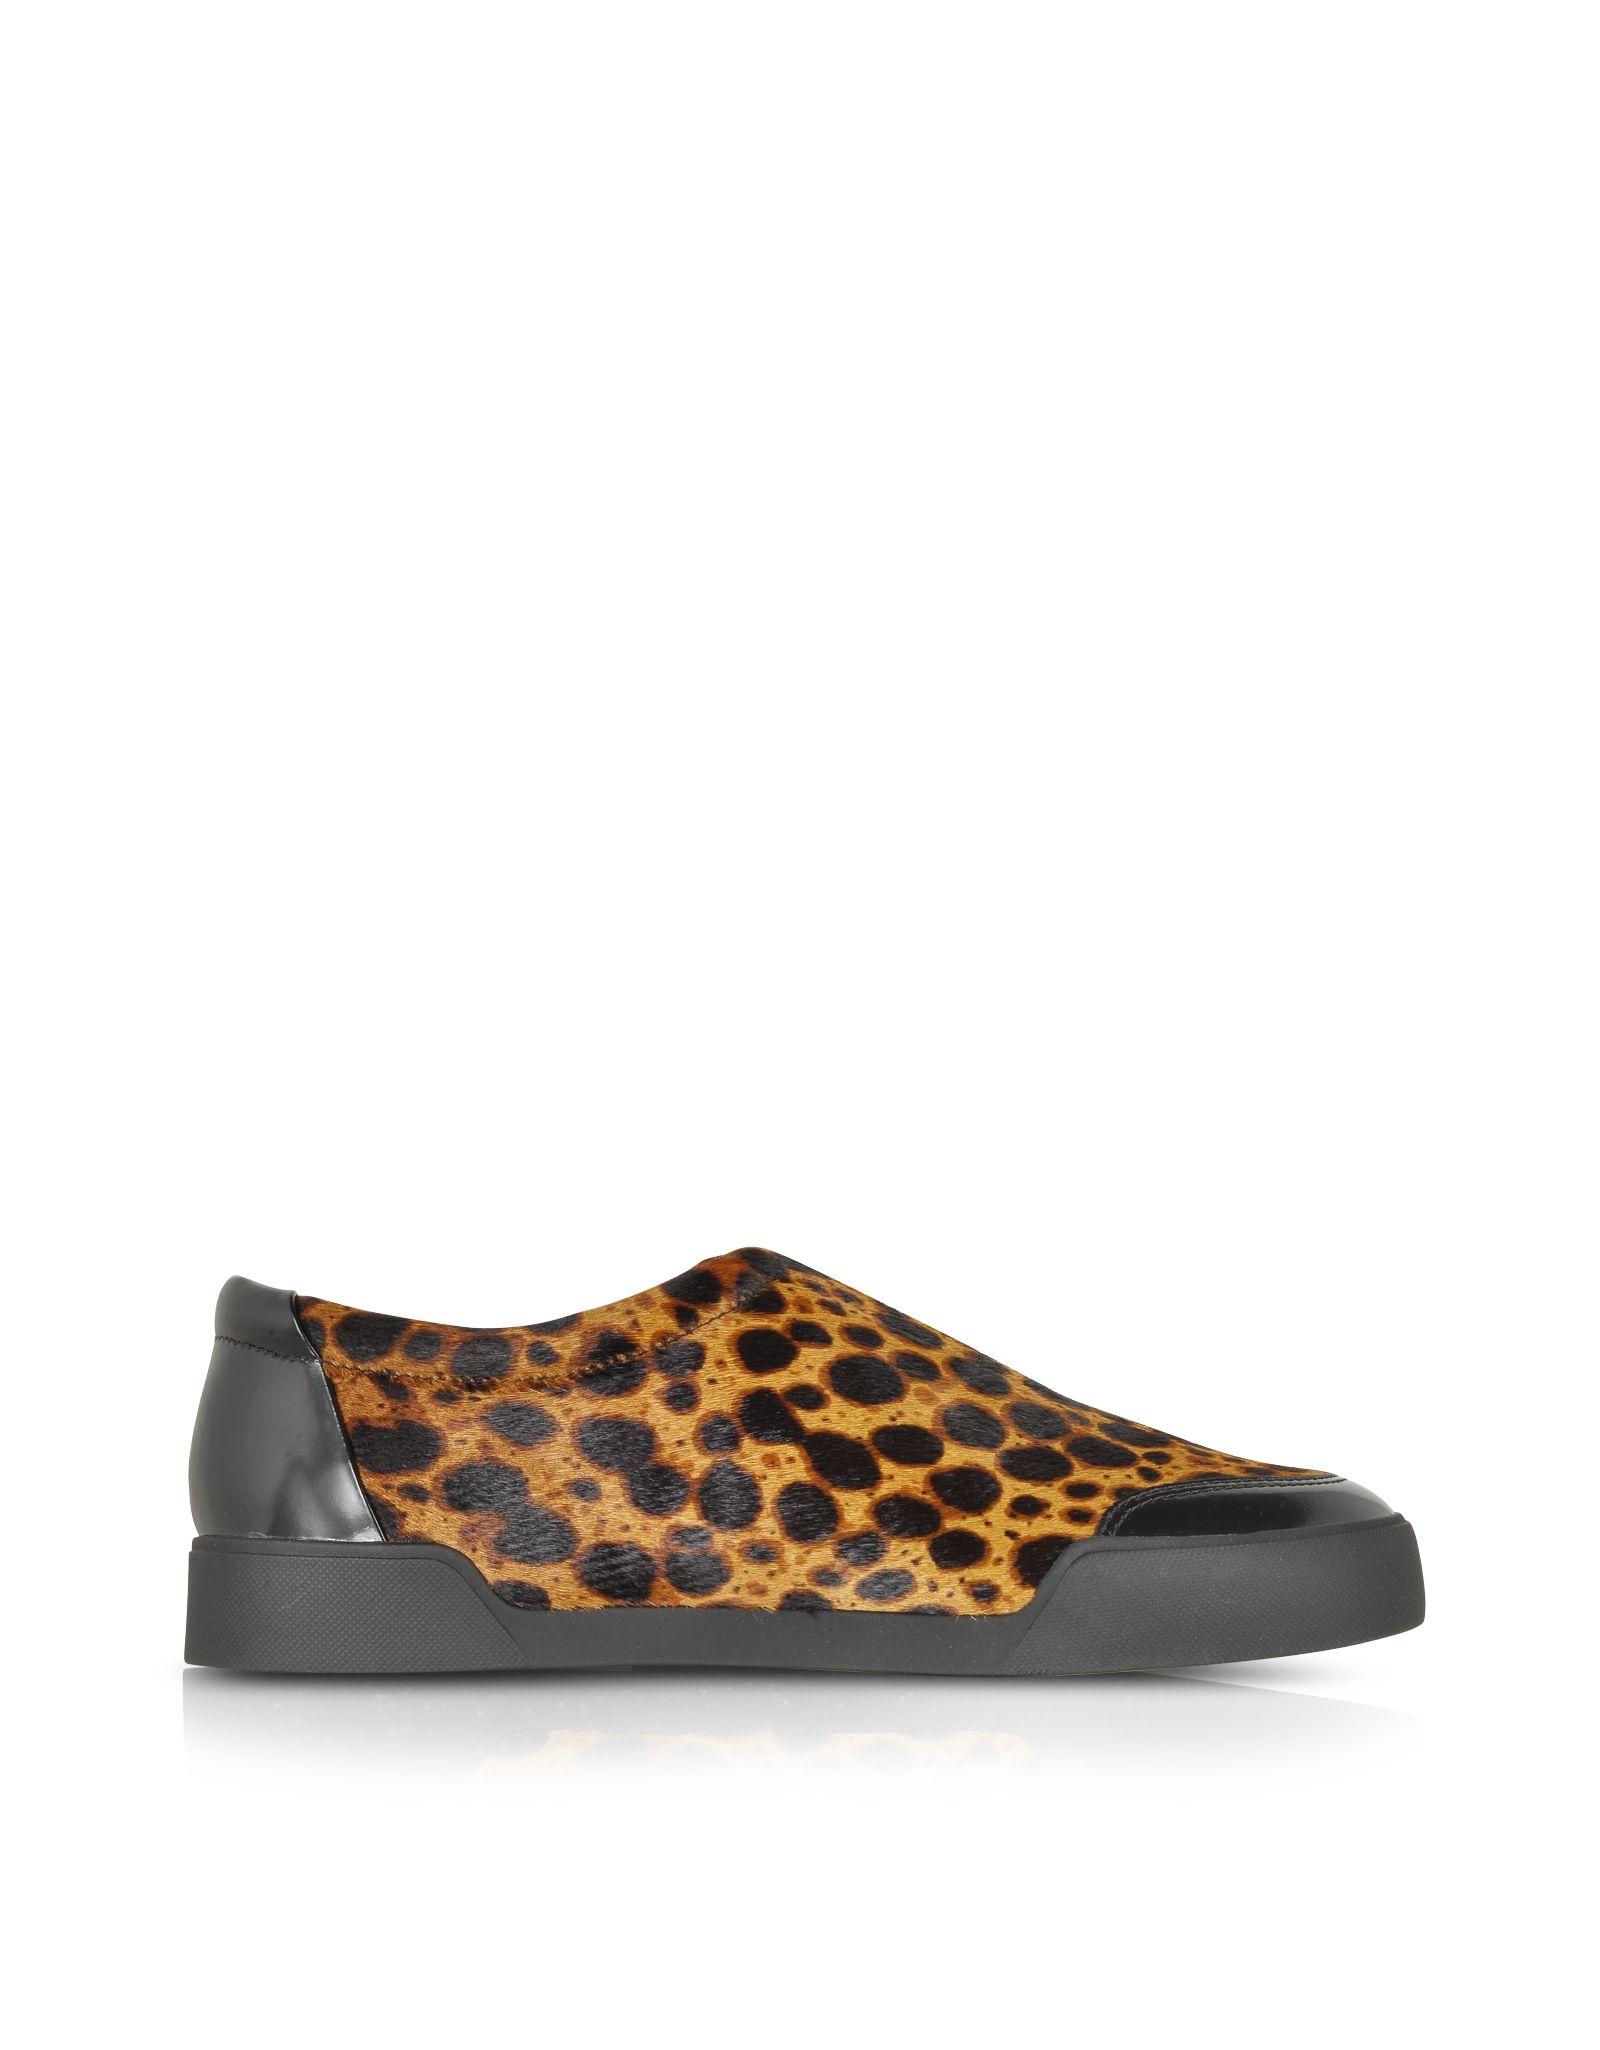 903f6f0bccf Printing · Shoes · Phillip Lim · 3.1 Phillip Lim Morgan Animal Print  Haircalf Low Top Sneaker at FORZIERI